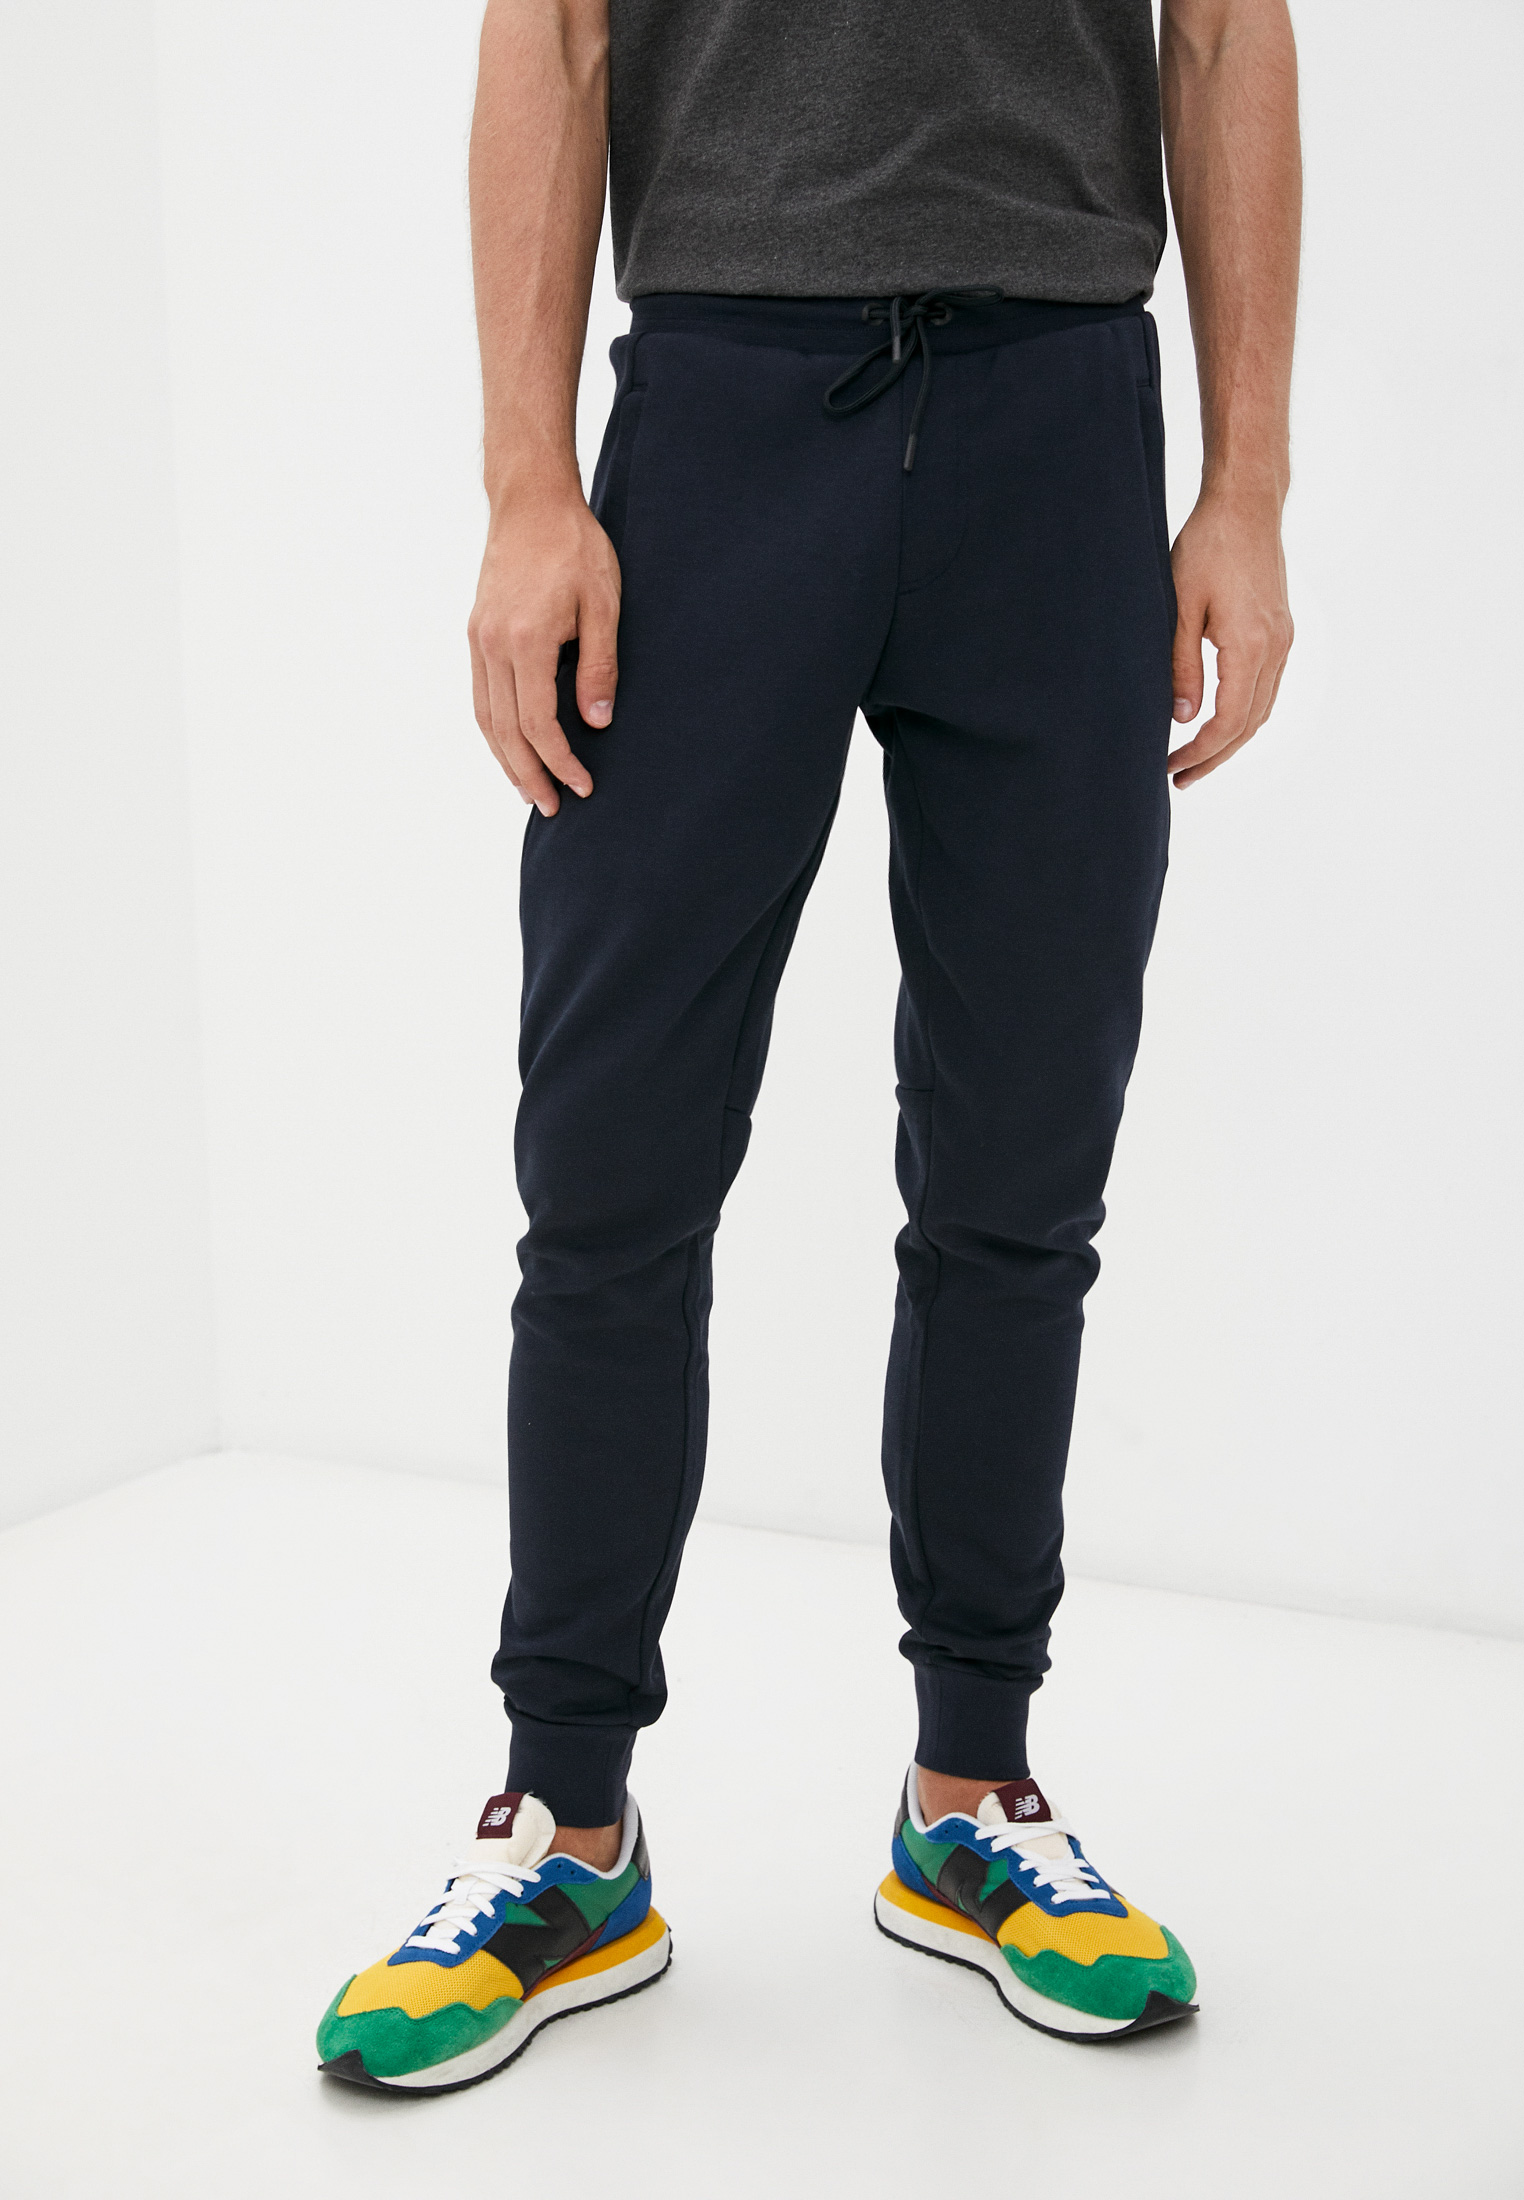 Мужские спортивные брюки Tommy Hilfiger (Томми Хилфигер) MW0MW20263